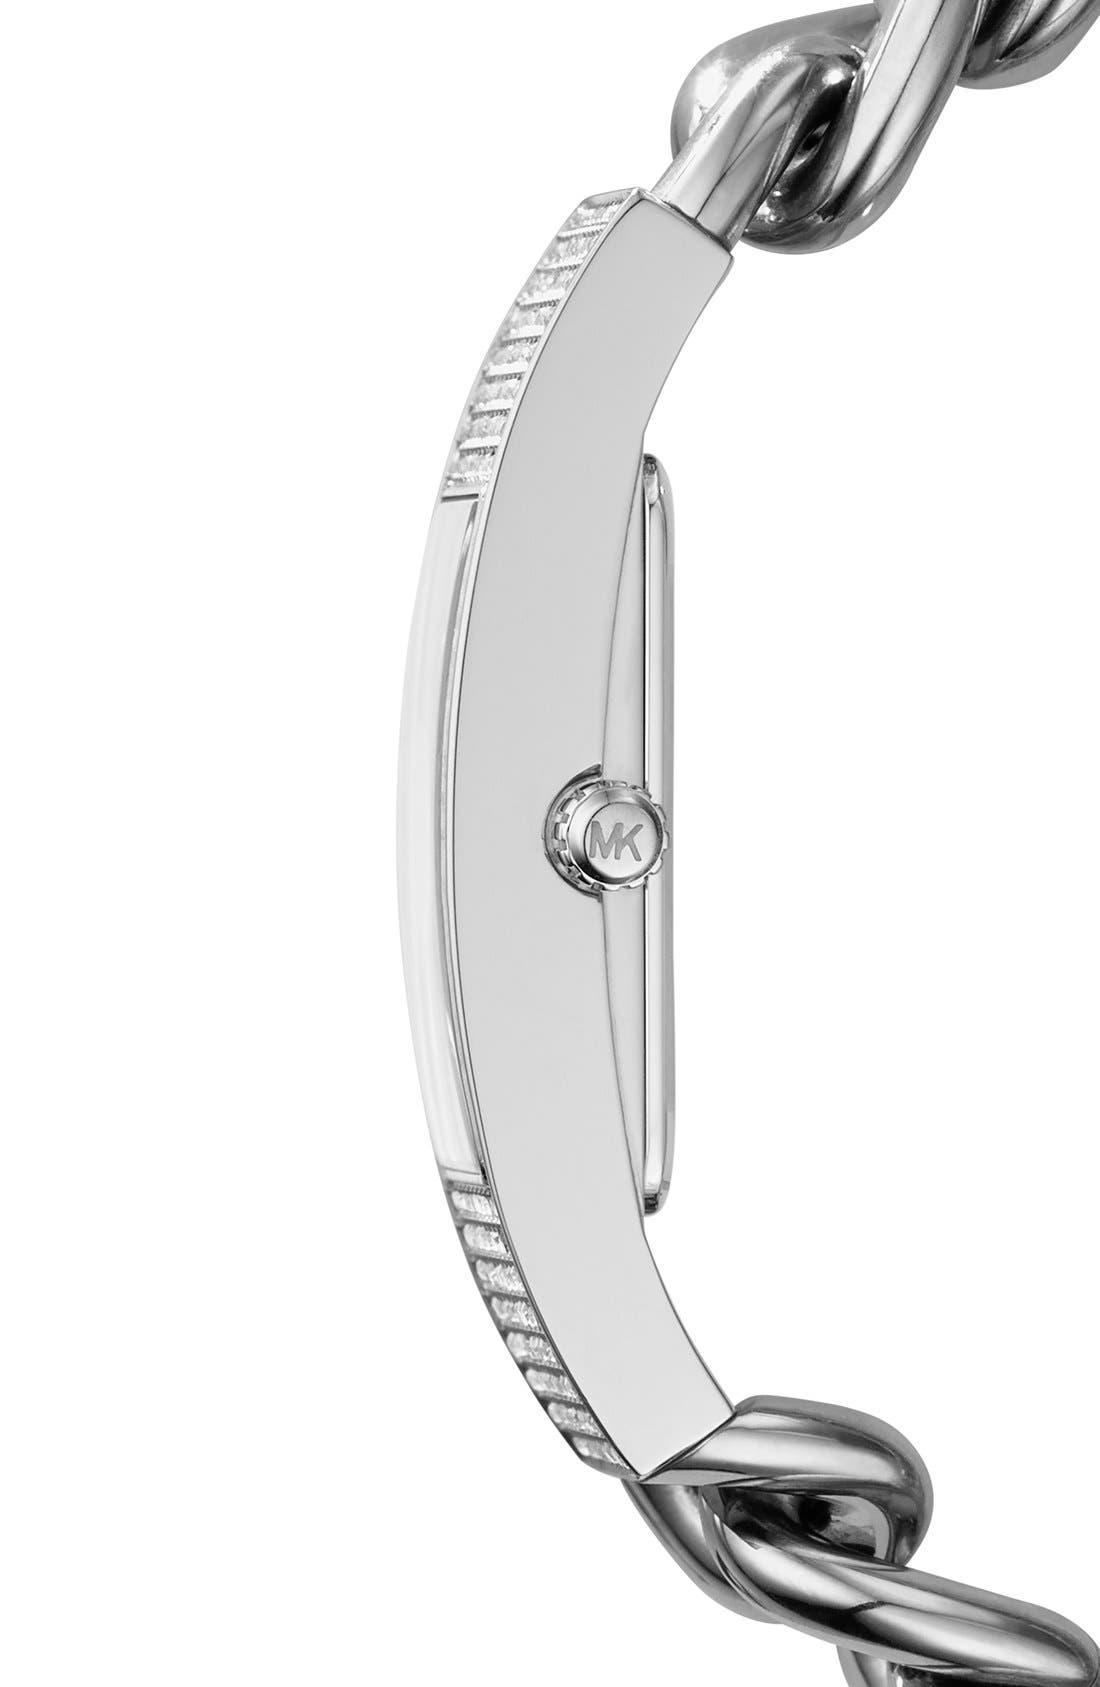 Alternate Image 3  - Michael Kors 'Hayden' Pavé Crystal Chain Link Bracelet Watch, 16mm